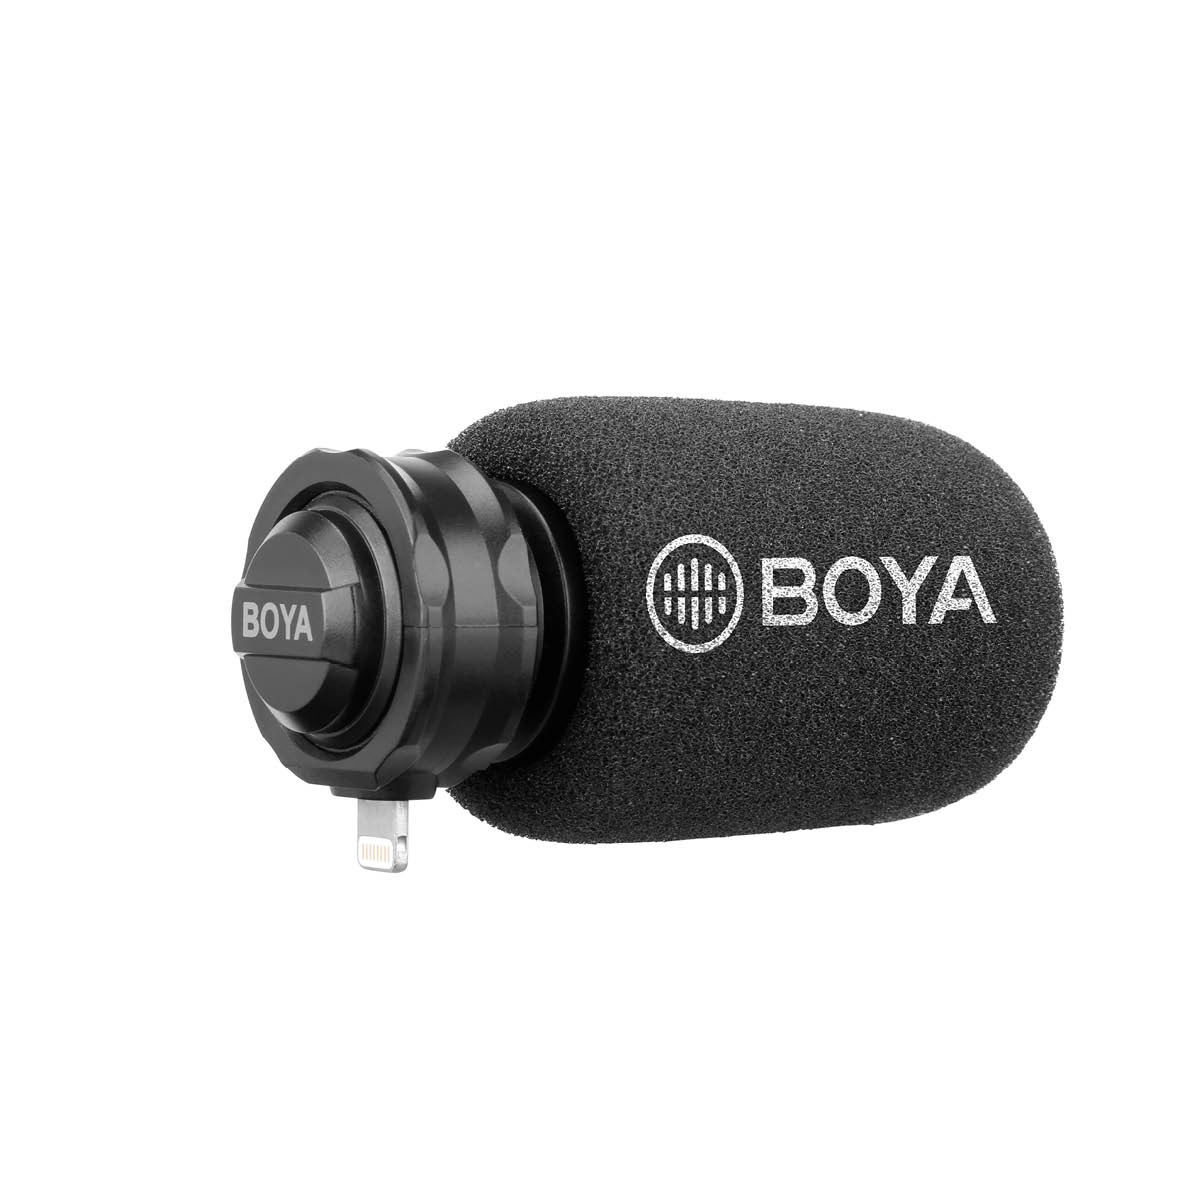 Boya BY-DM200 Kondensatormikrofon für Apple